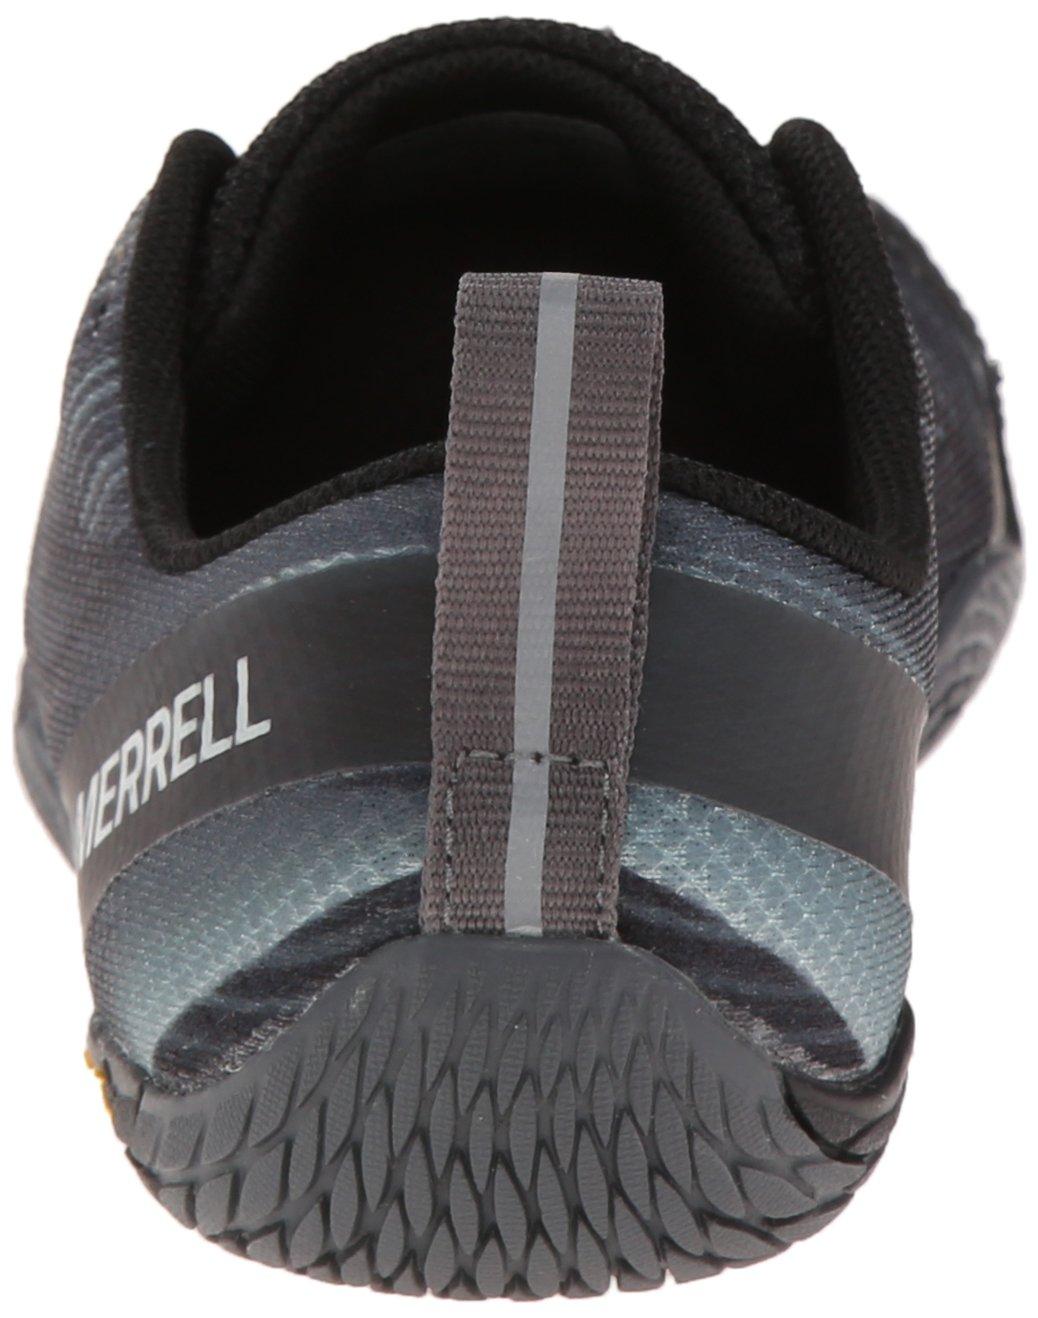 Merrell Women's Vapor Glove 2 Trail Running Shoe, Black/Castle Rock, 6 M US by Merrell (Image #2)